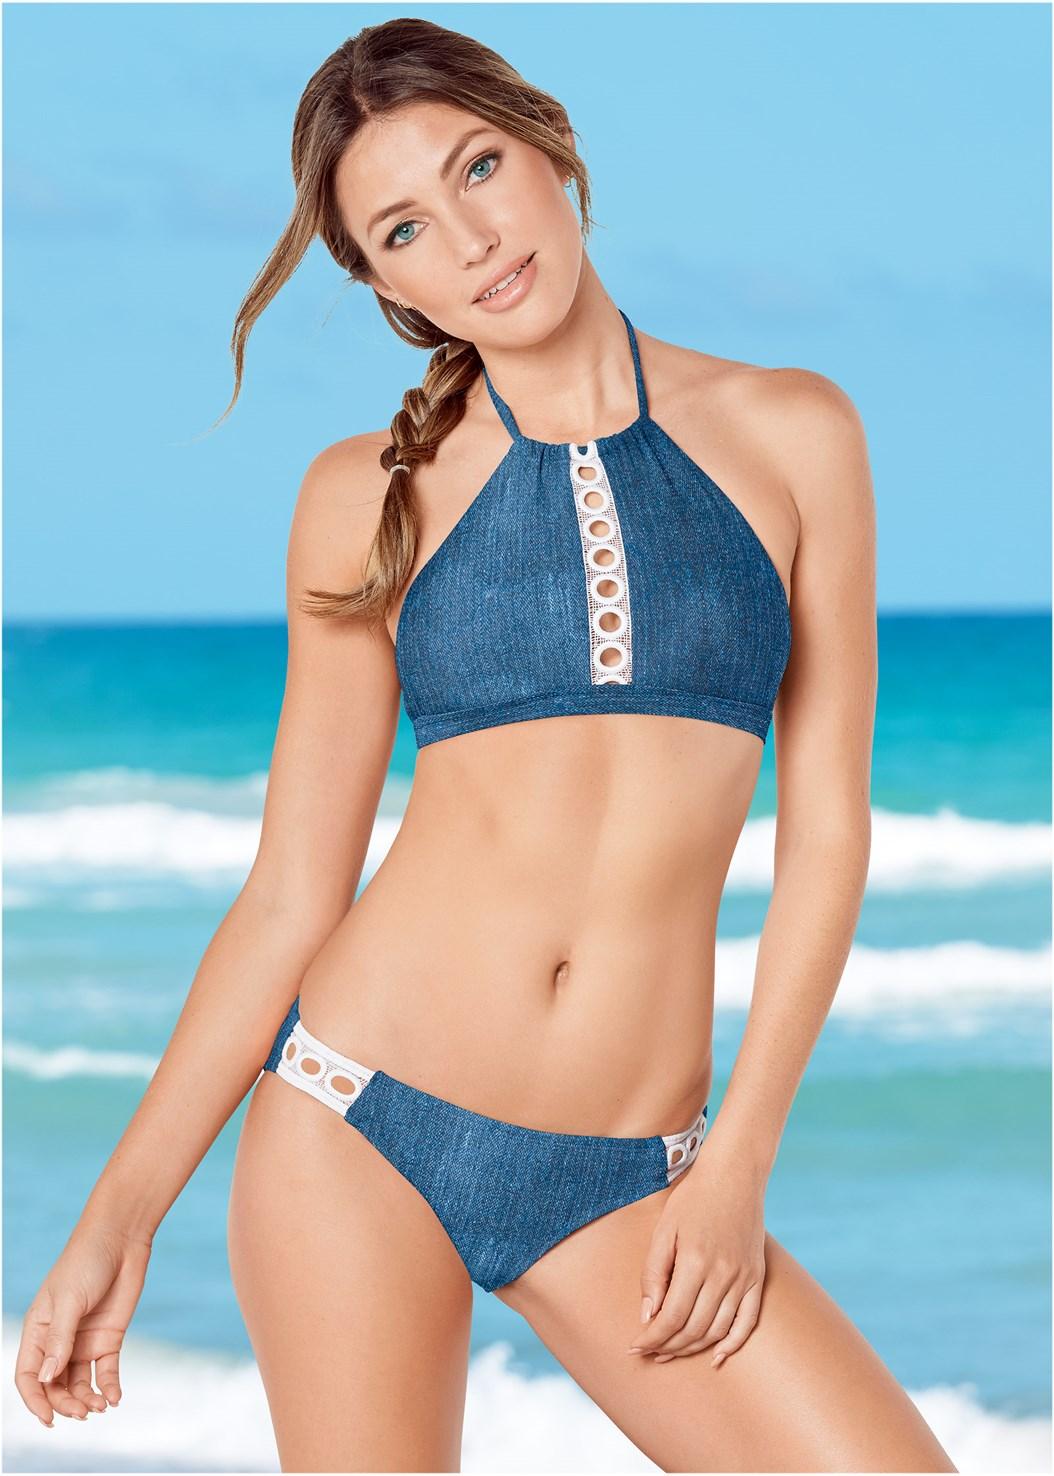 Eyelet Detail Sport Top,Eyelet Trim Bikini Bottom,Scoop Front Classic Bikini Bottom ,String Side Bikini Bottom,Hoodie Cover-Up